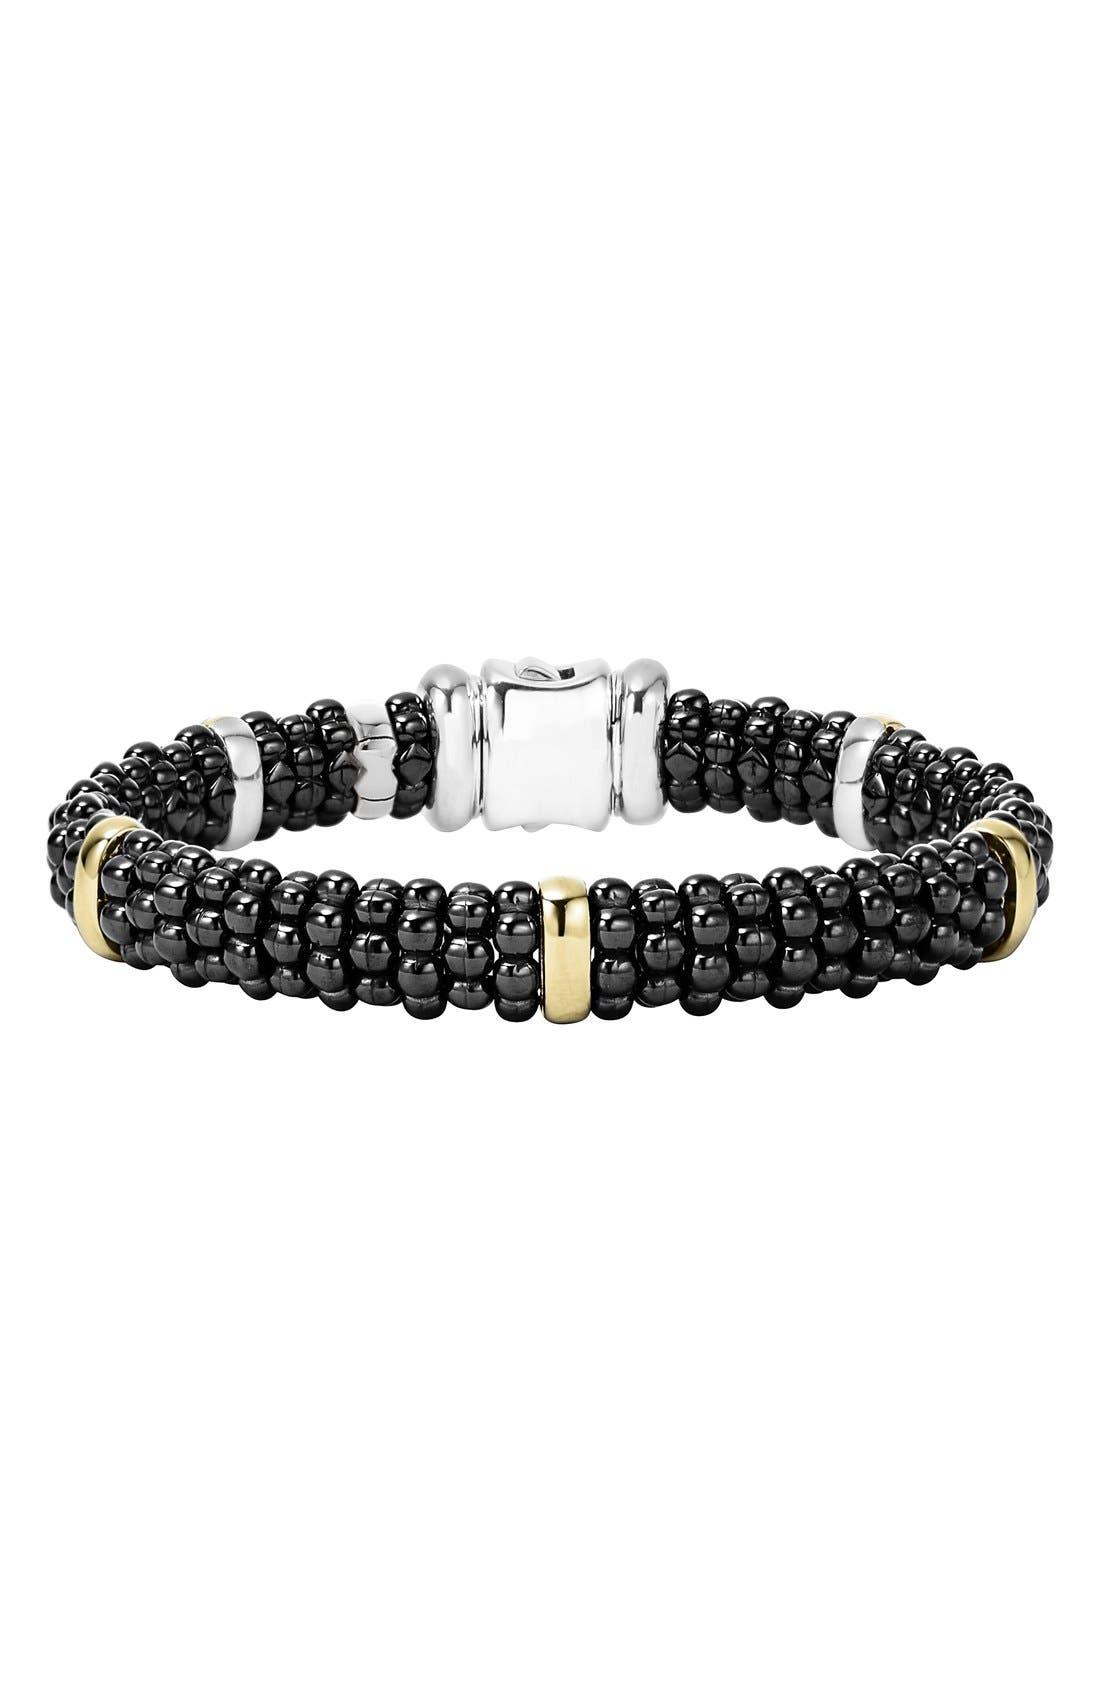 LAGOS Black Caviar Rope Bracelet